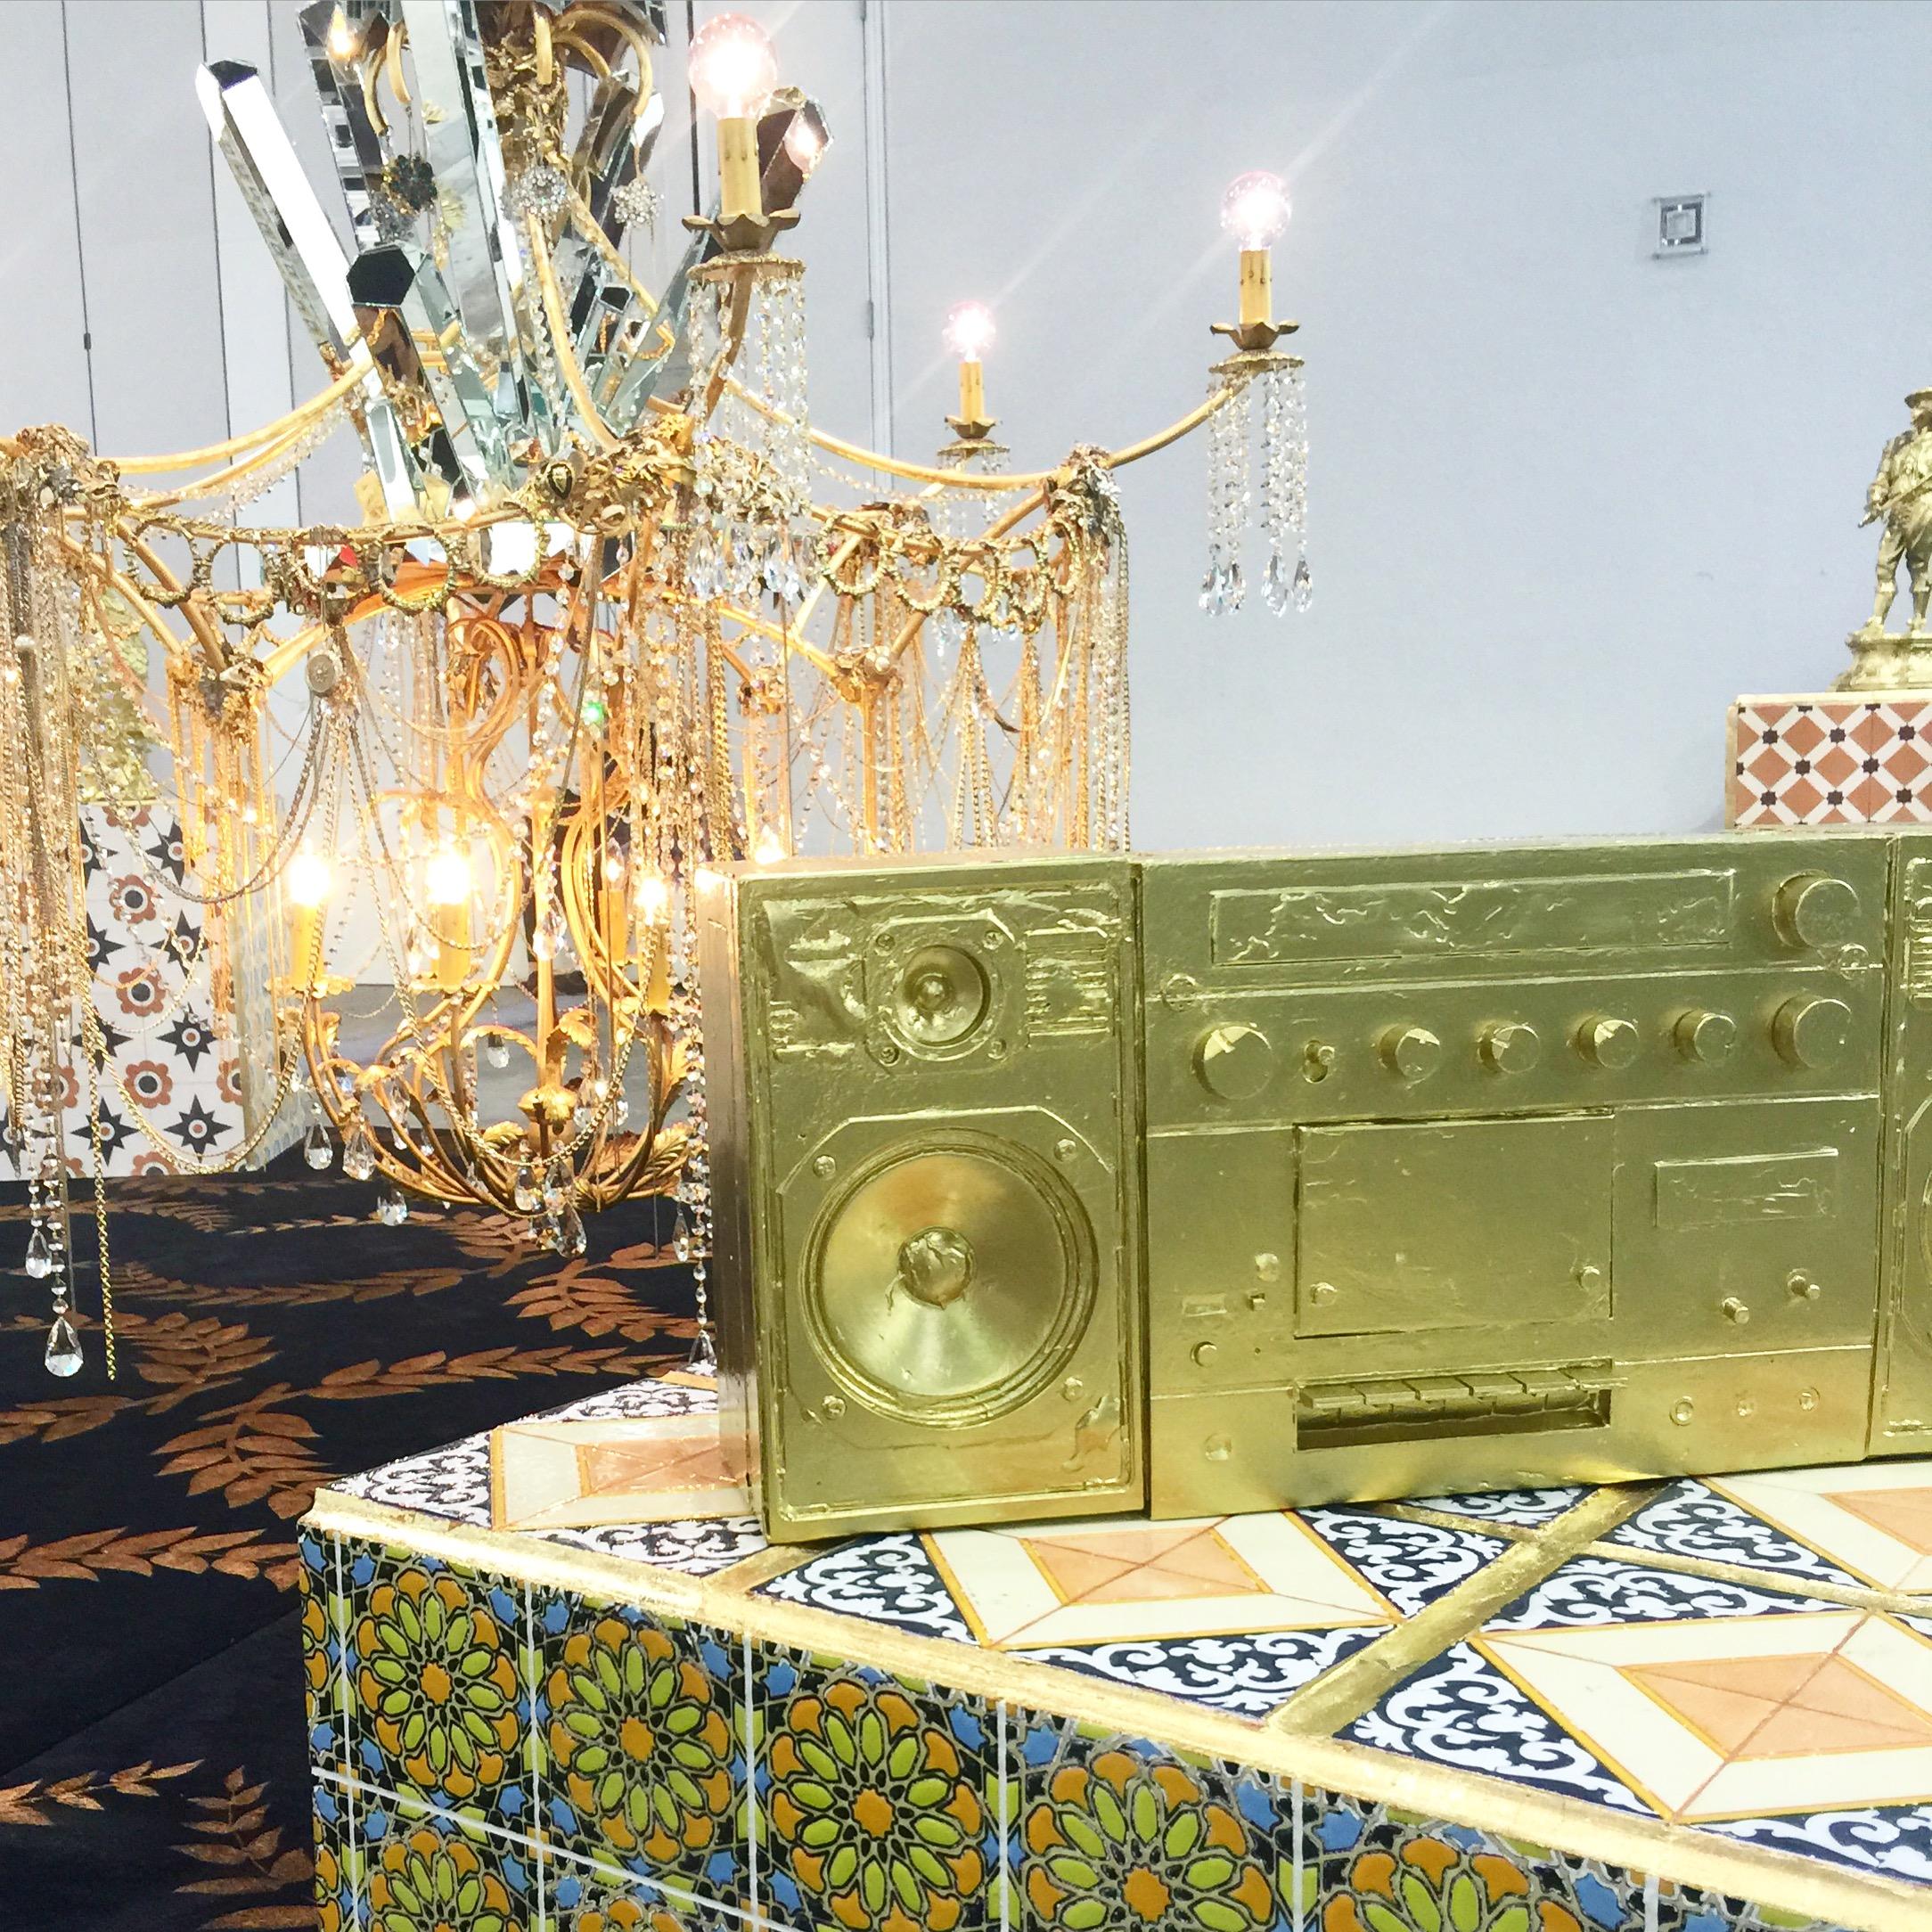 Carlos Rolon/Dzine's installation